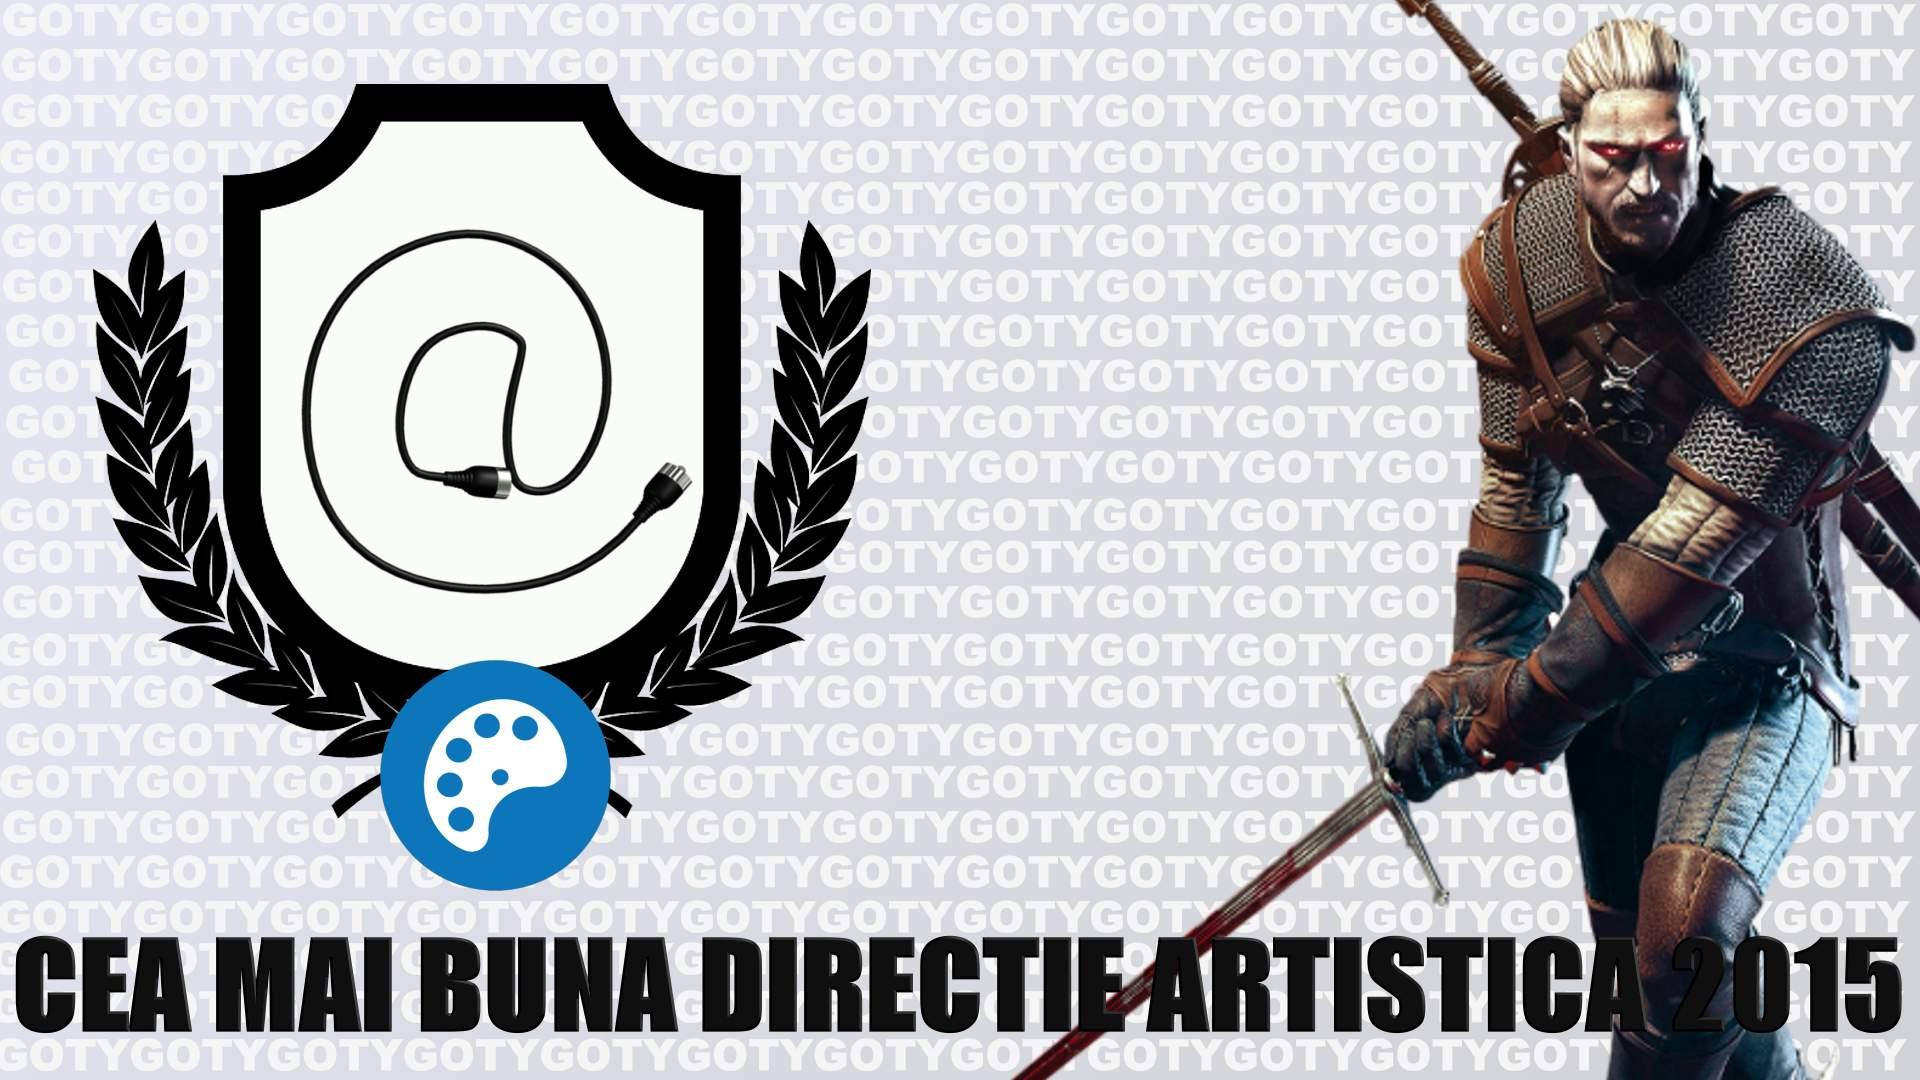 DIRECTIE ARTISTICA